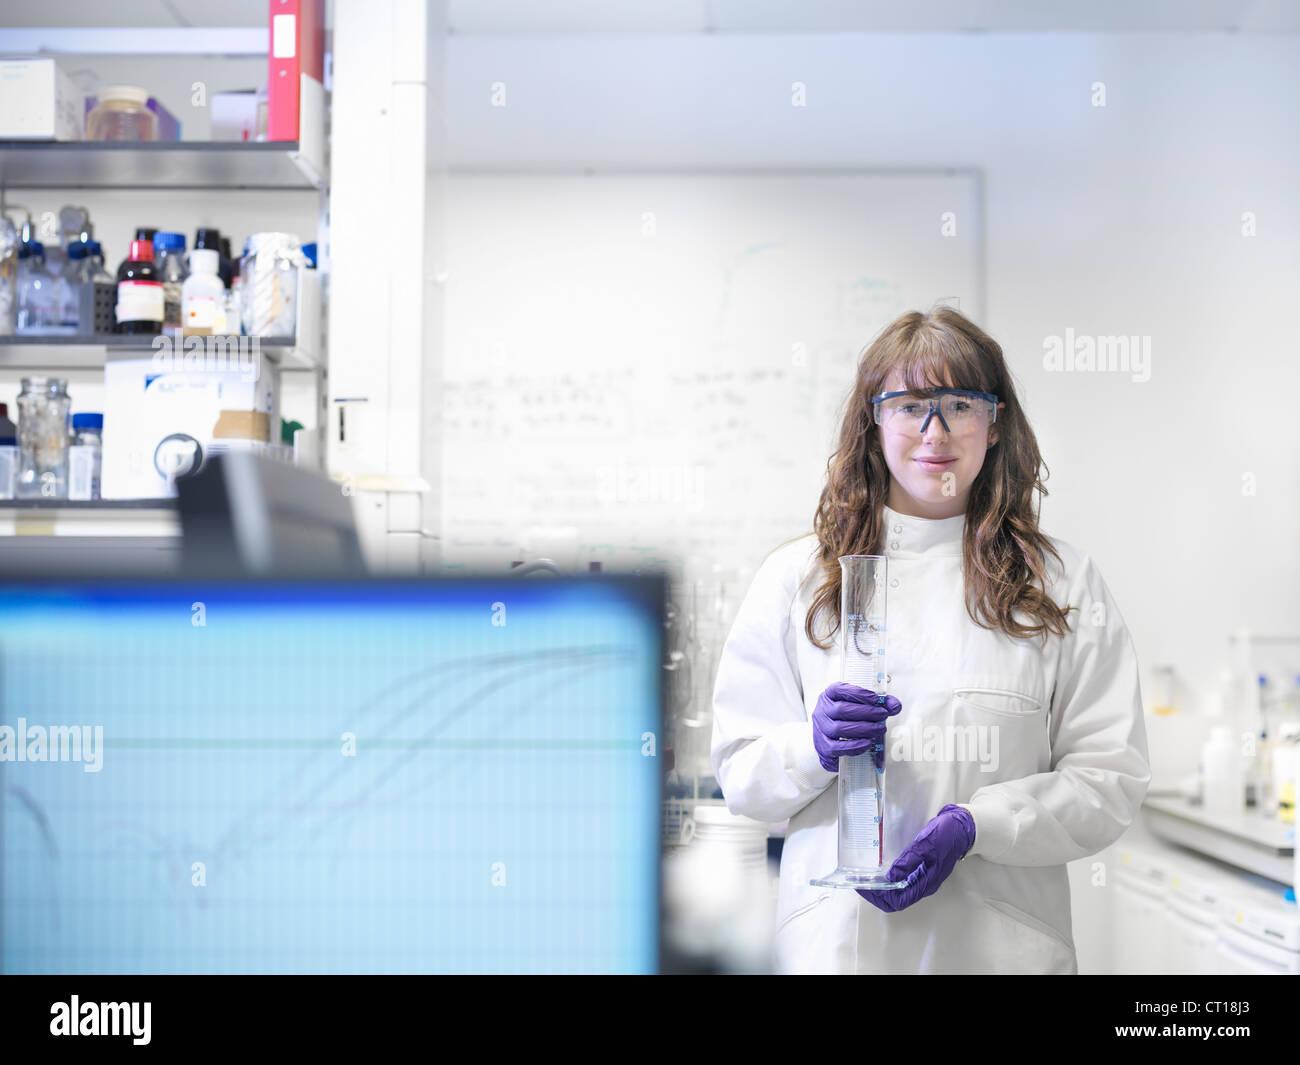 Scientist carrying beaker in lab - Stock Image